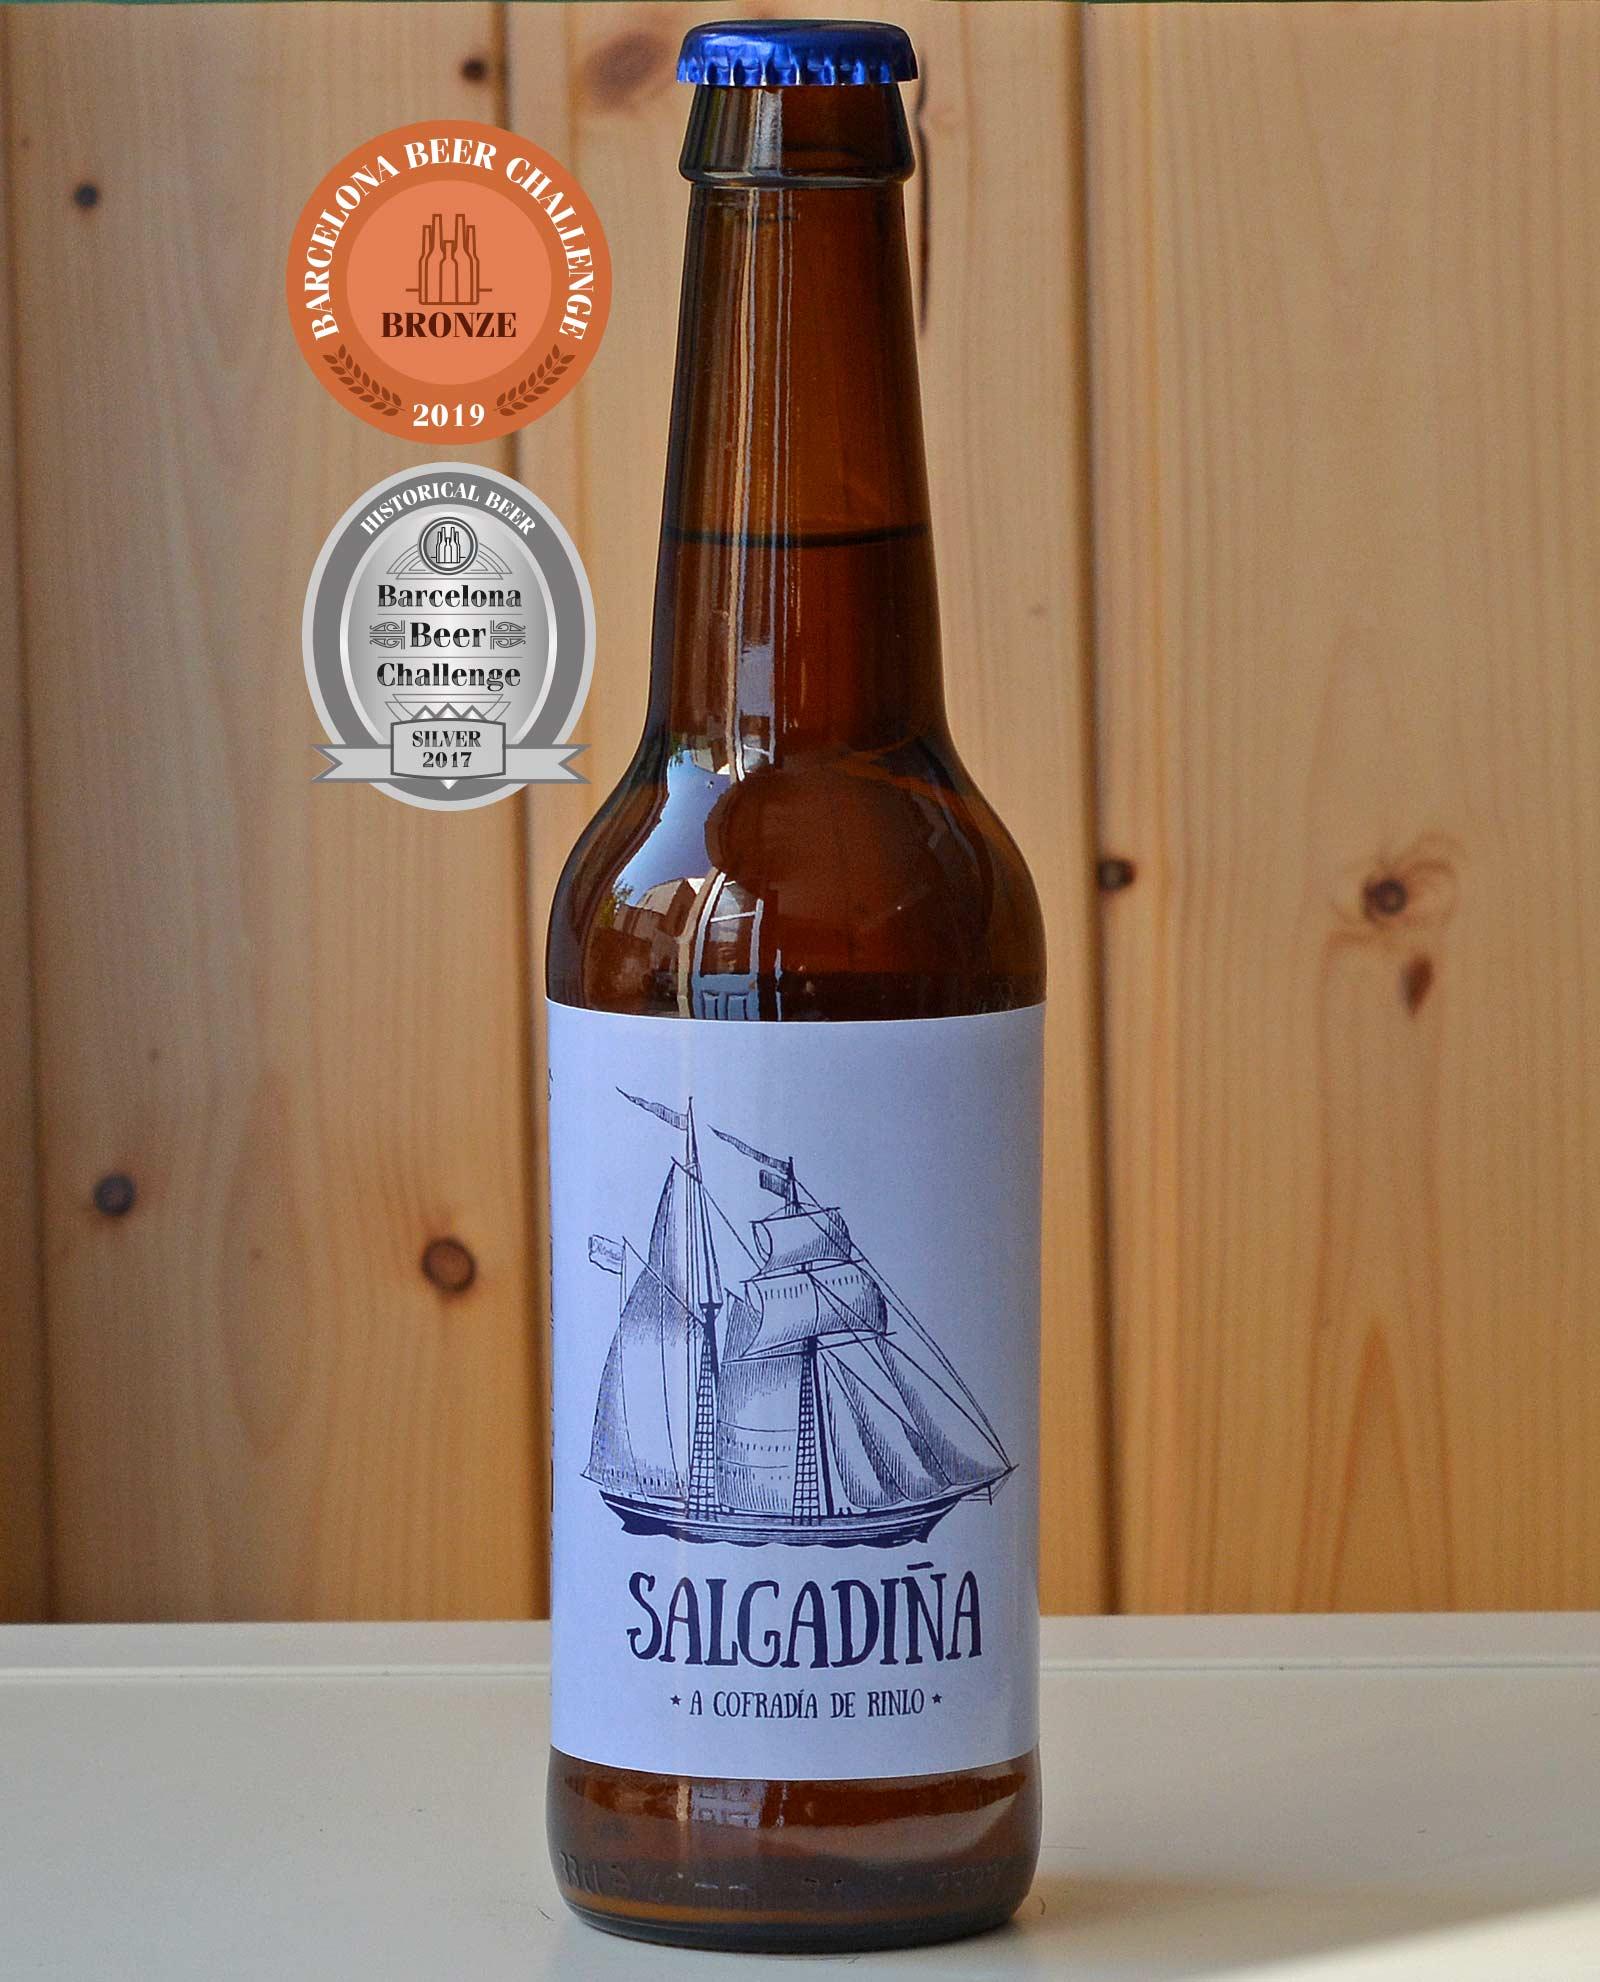 aloumina-cerveza-artesana-craft-beer-lugo-galicia-salgadina-cofradiaderinlo-gose-001dd